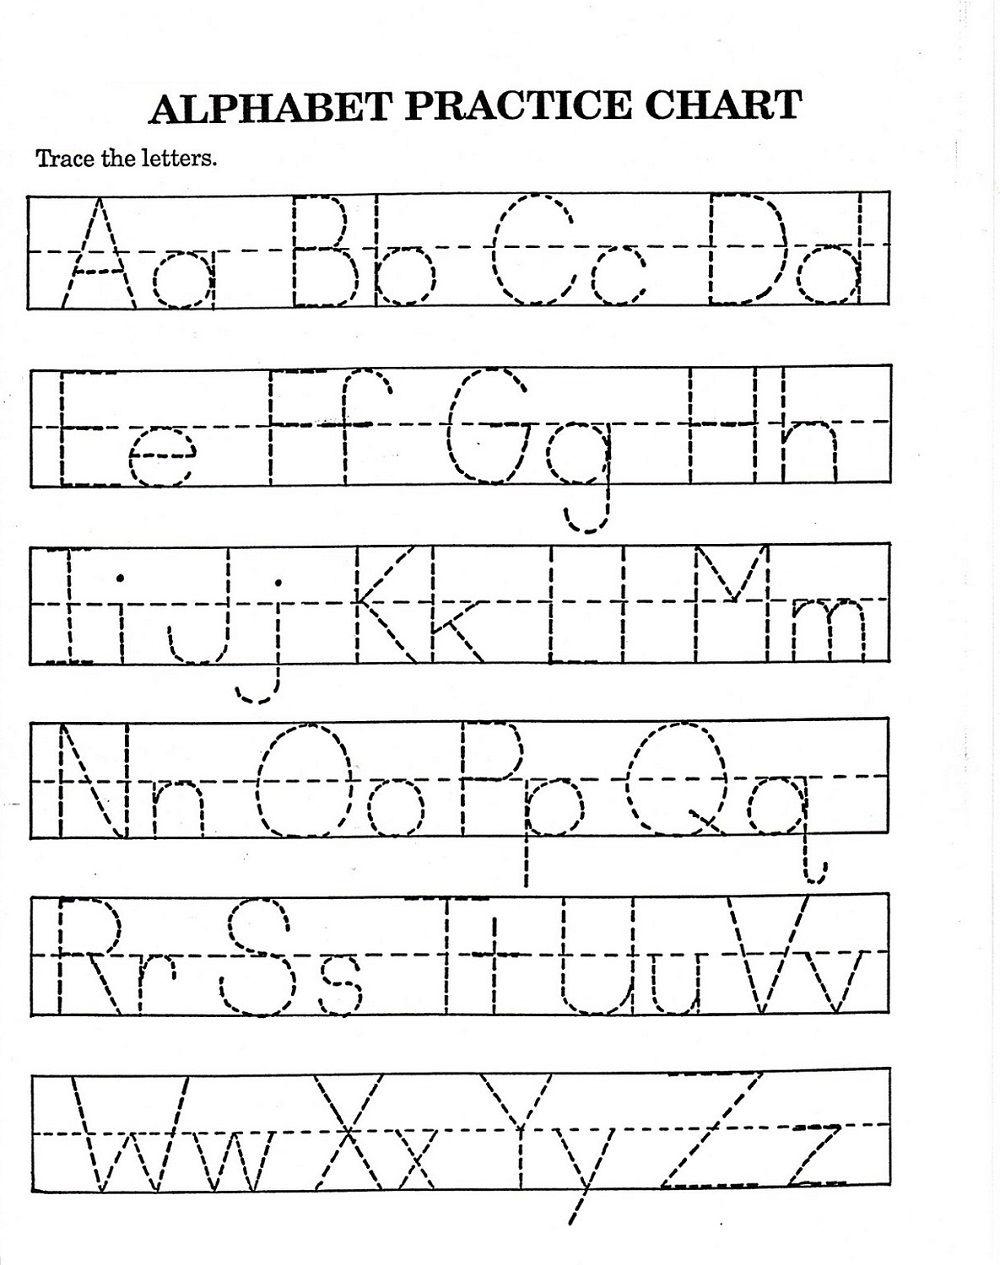 Traceable Alphabet Worksheets A-Z | Alphabet Worksheets Free pertaining to Alphabet Tracing Worksheets A-Z Pdf